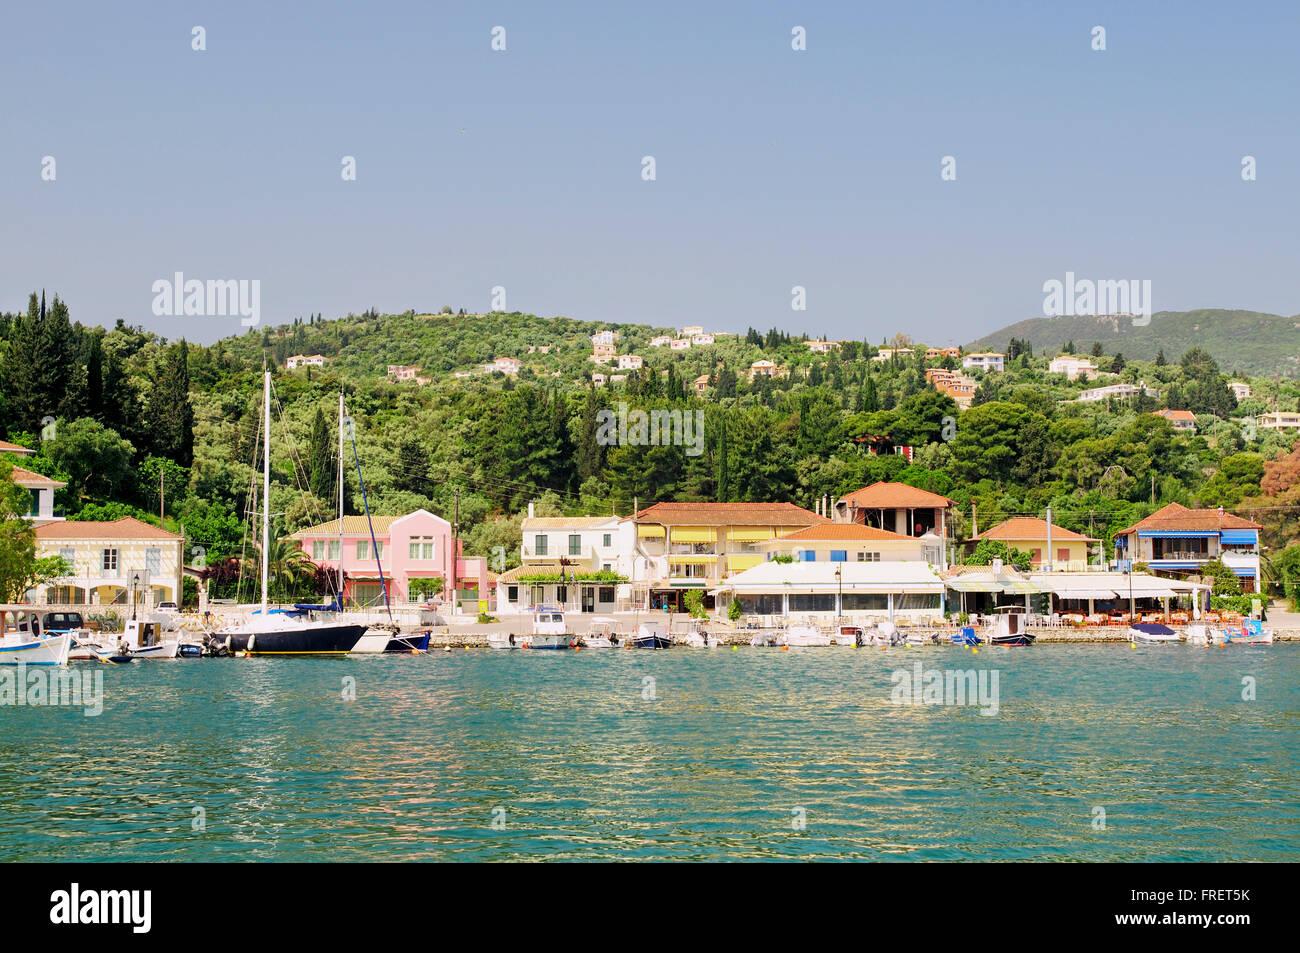 Greece, Ionian Islands, Lefkada, Lygia, waterfront - Stock Image